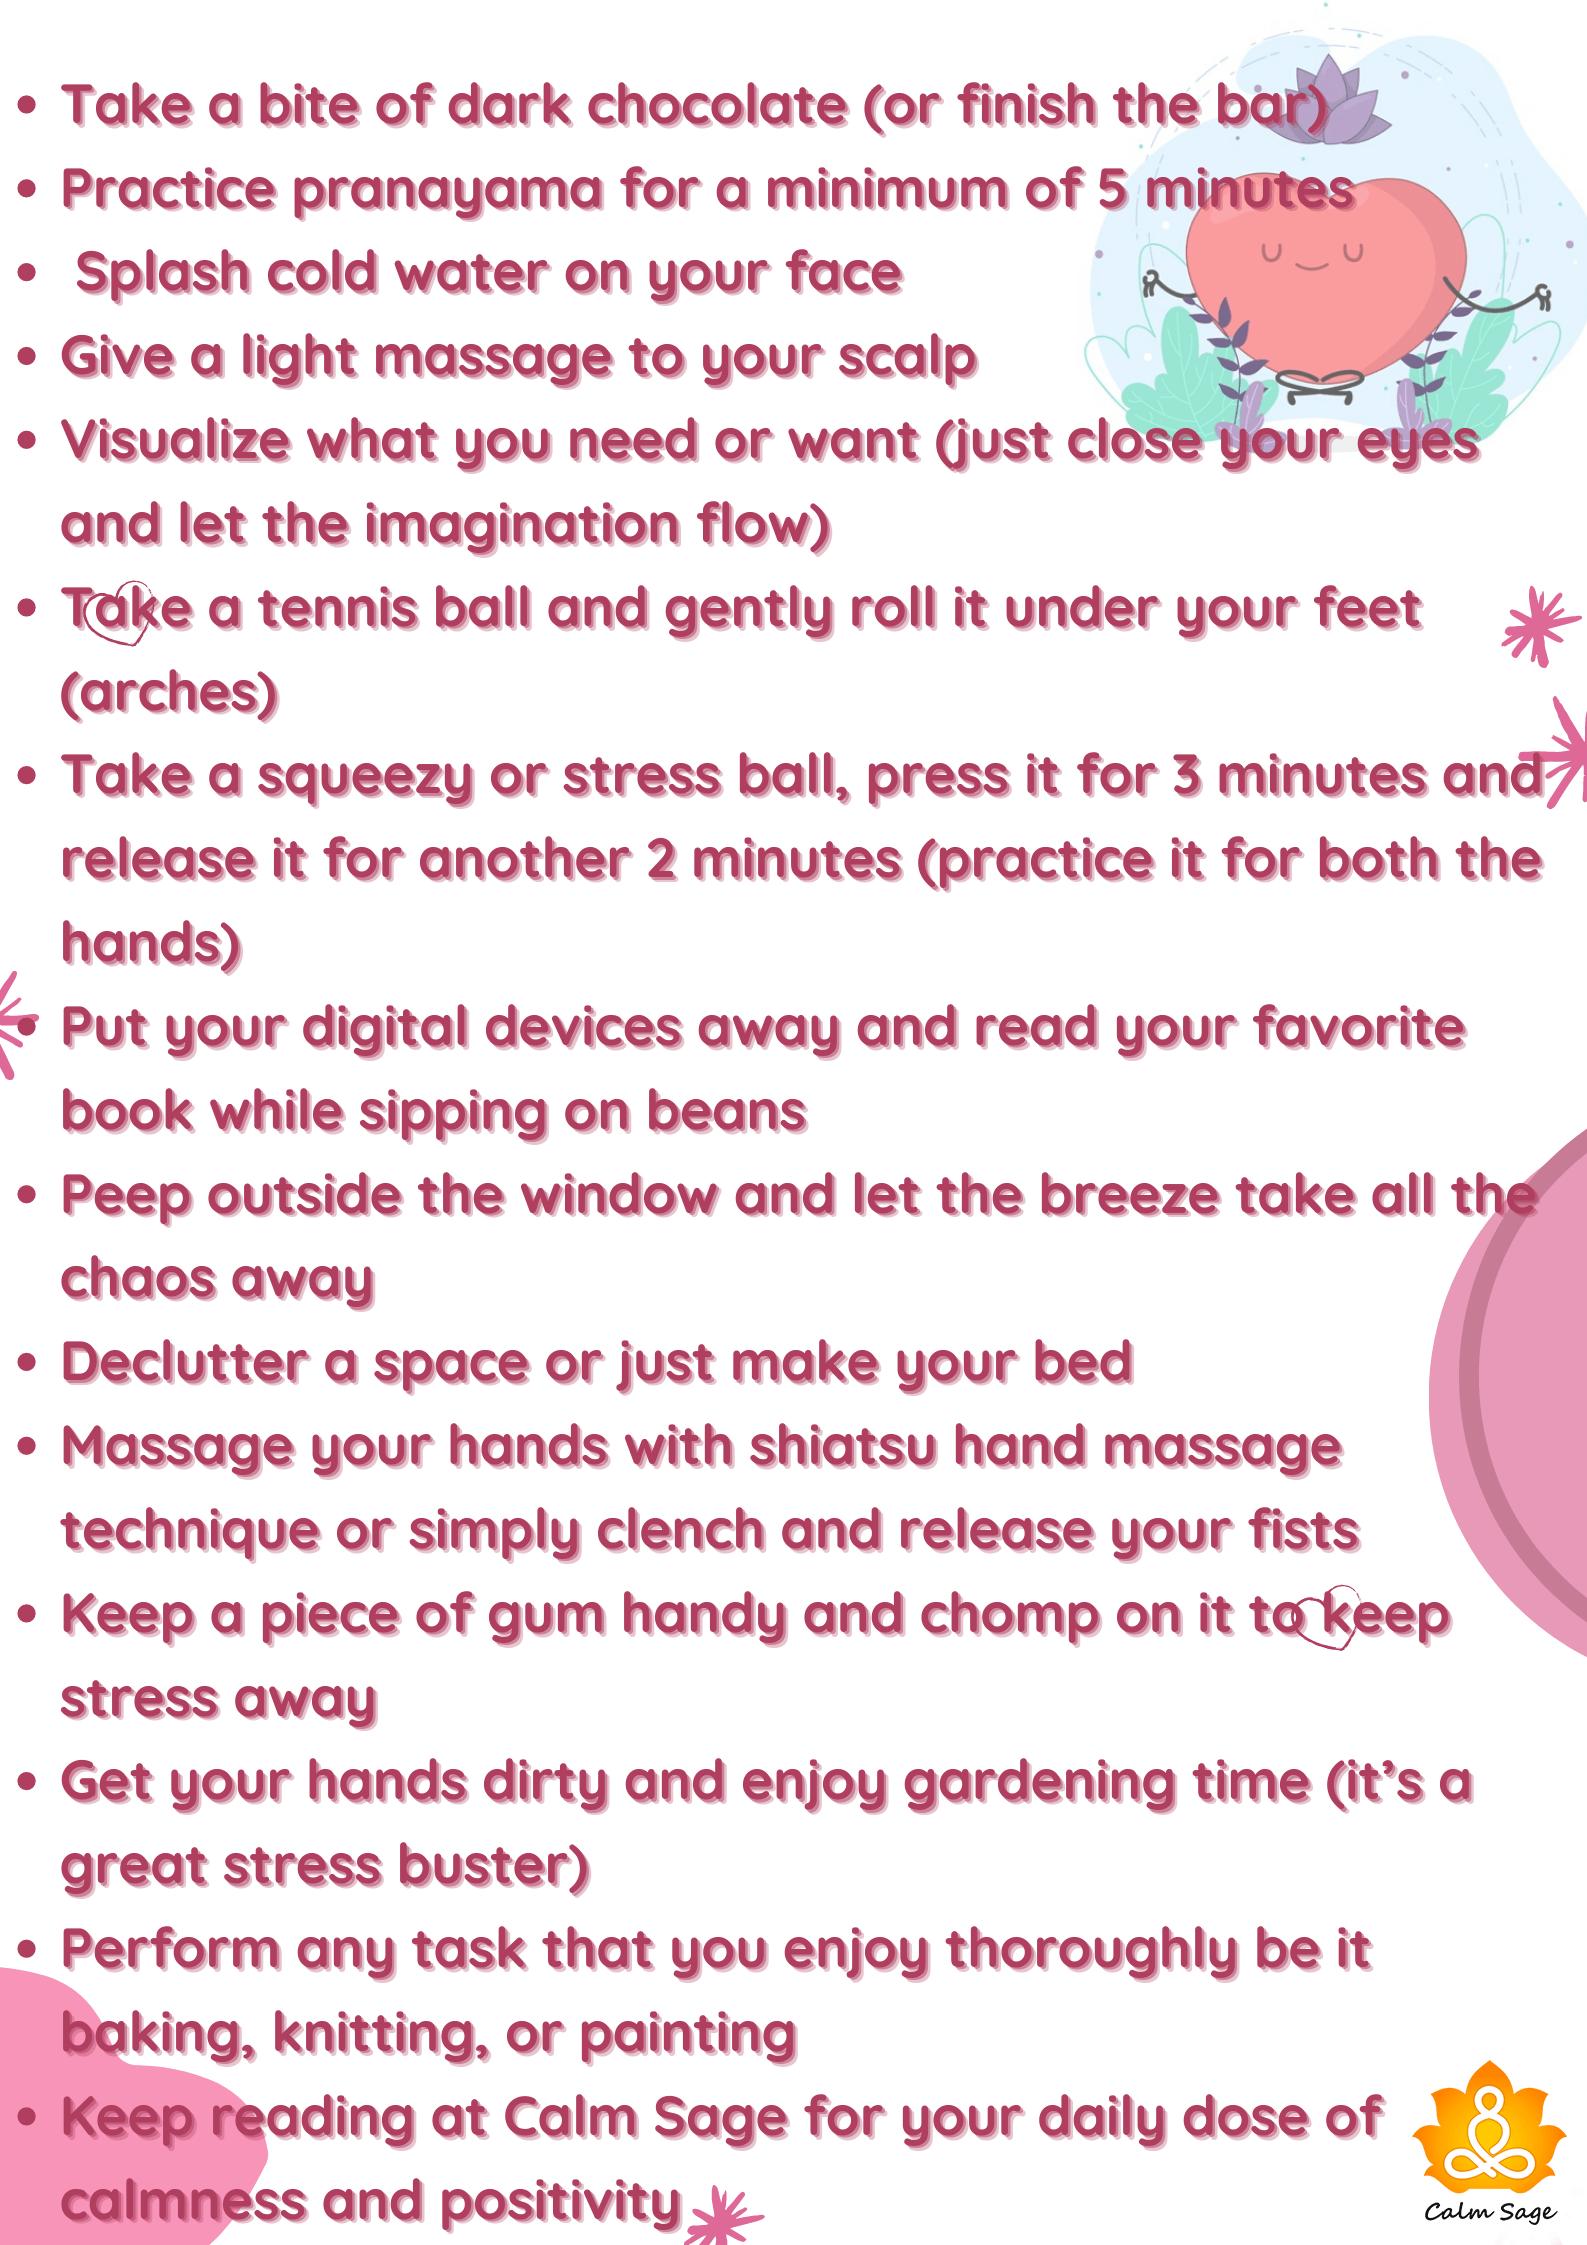 How to keep you Mind calm